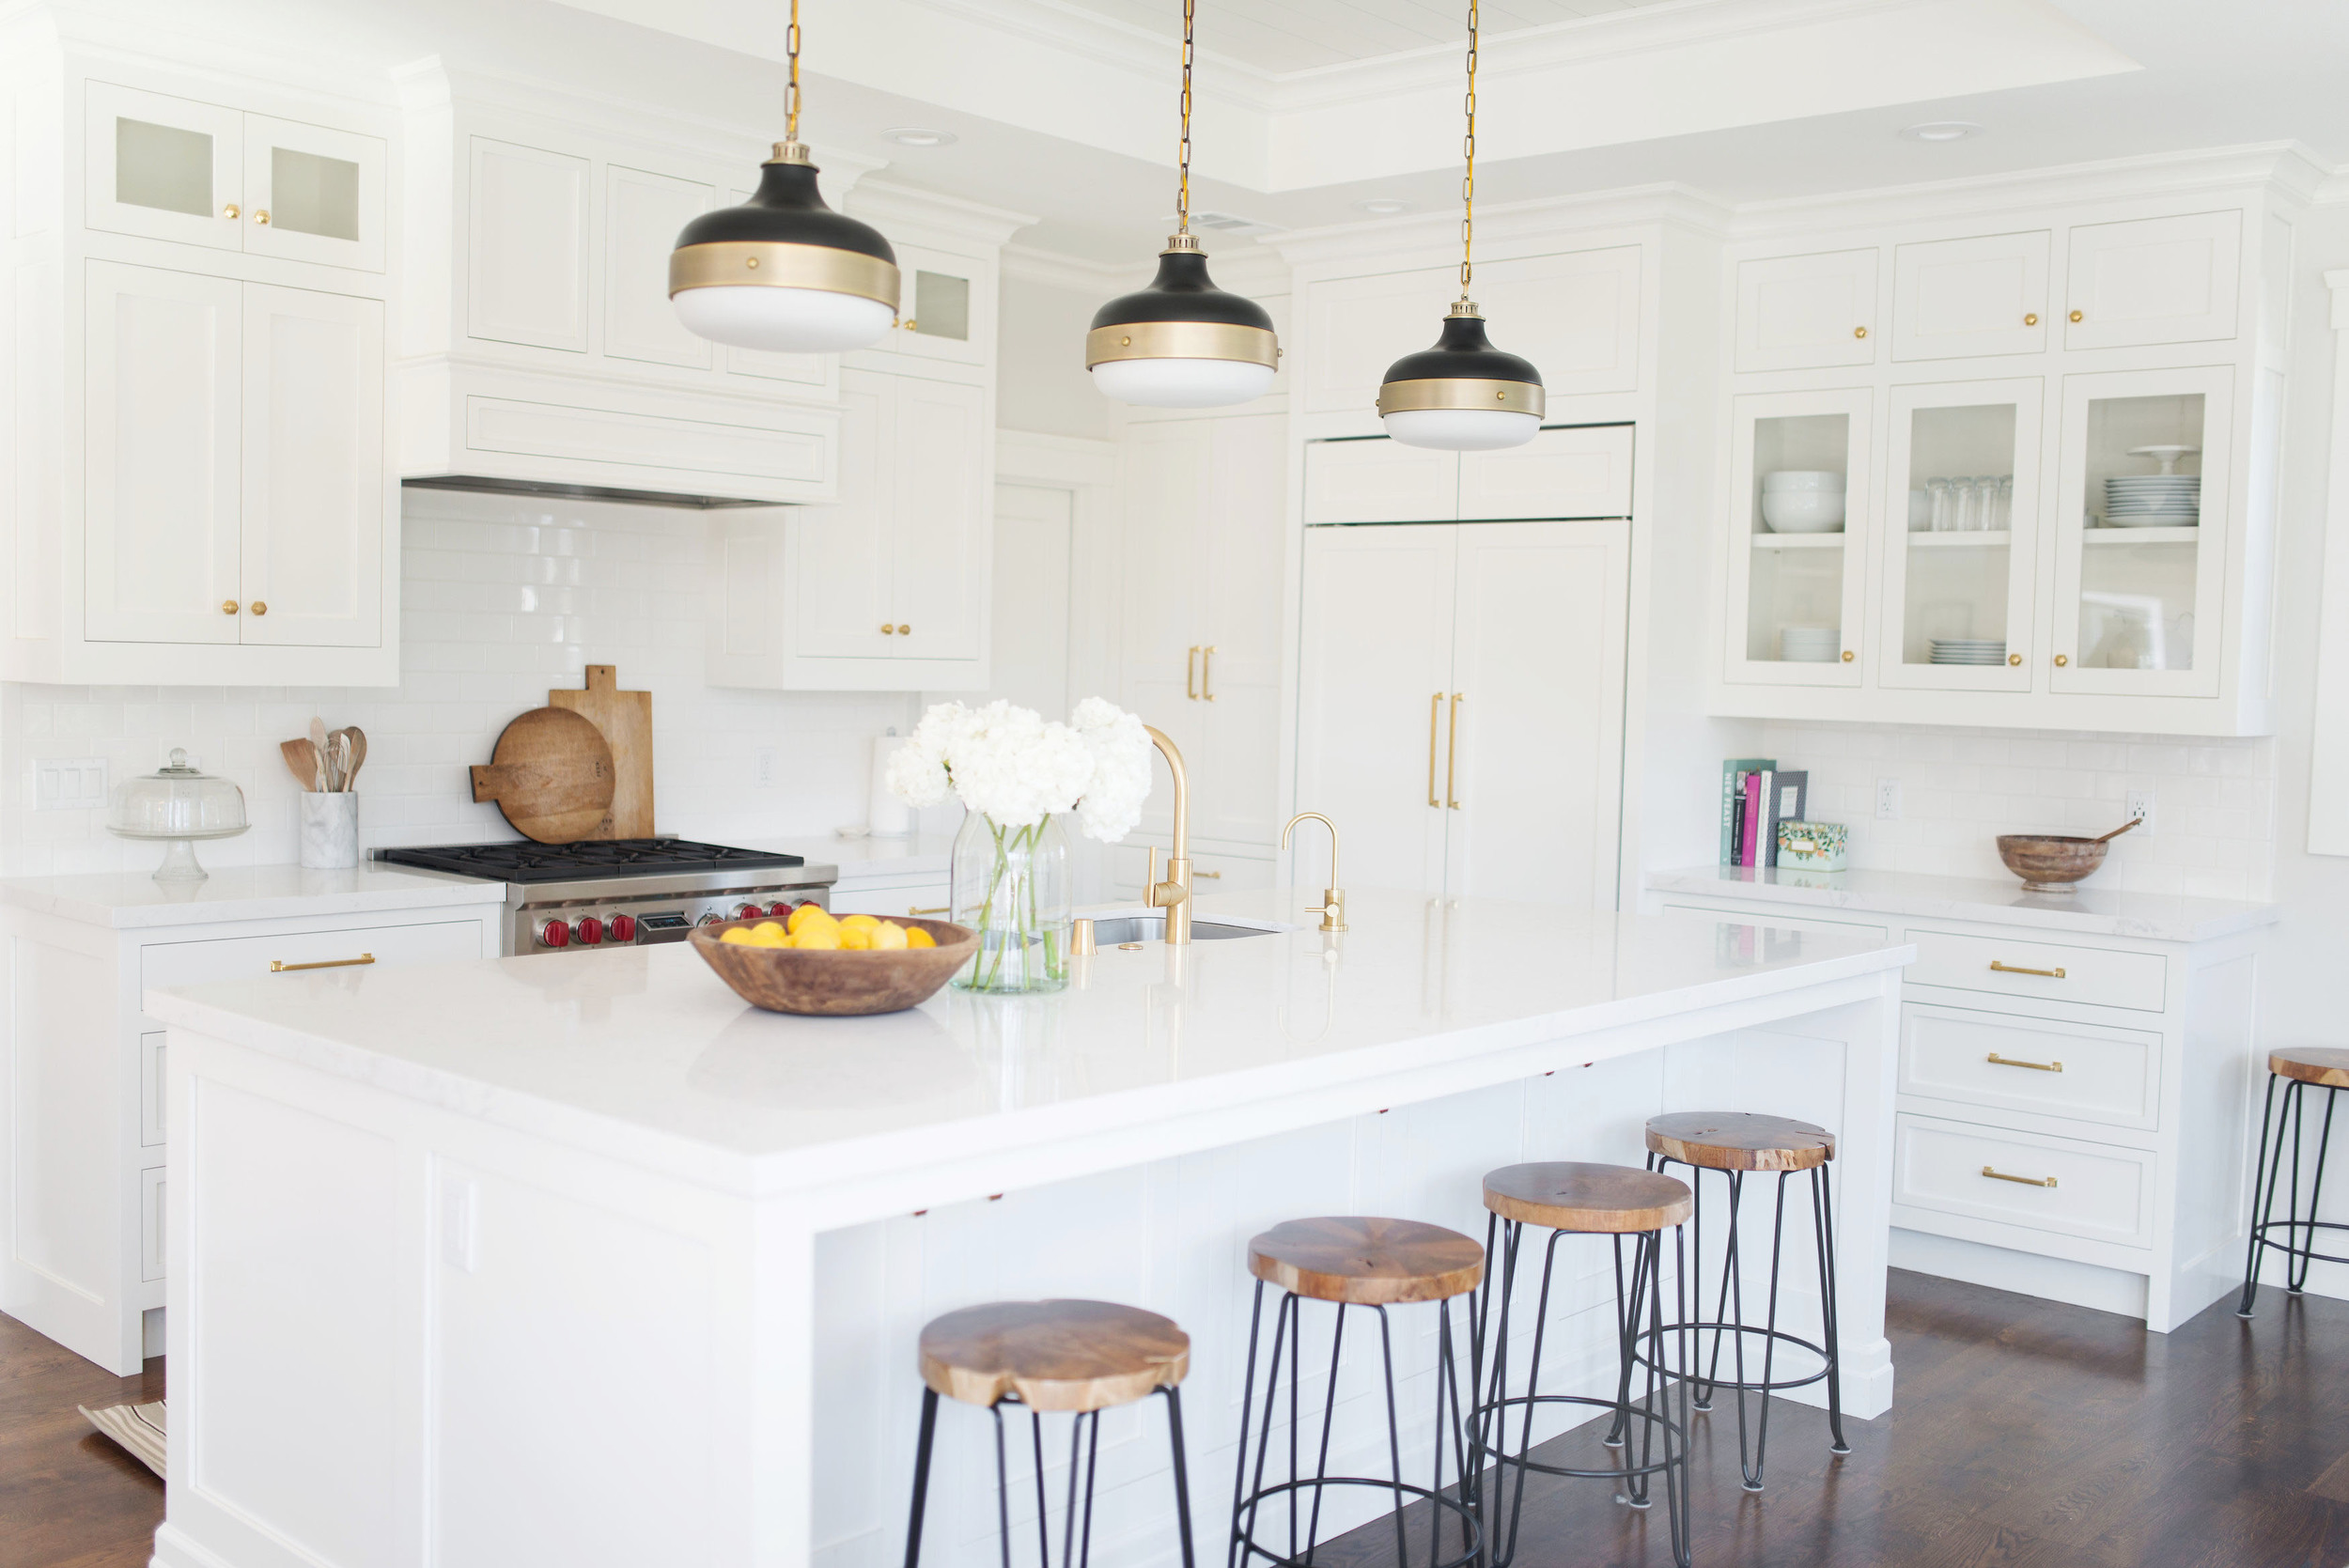 White and Gold Kitchen E-Design by Studio McGee